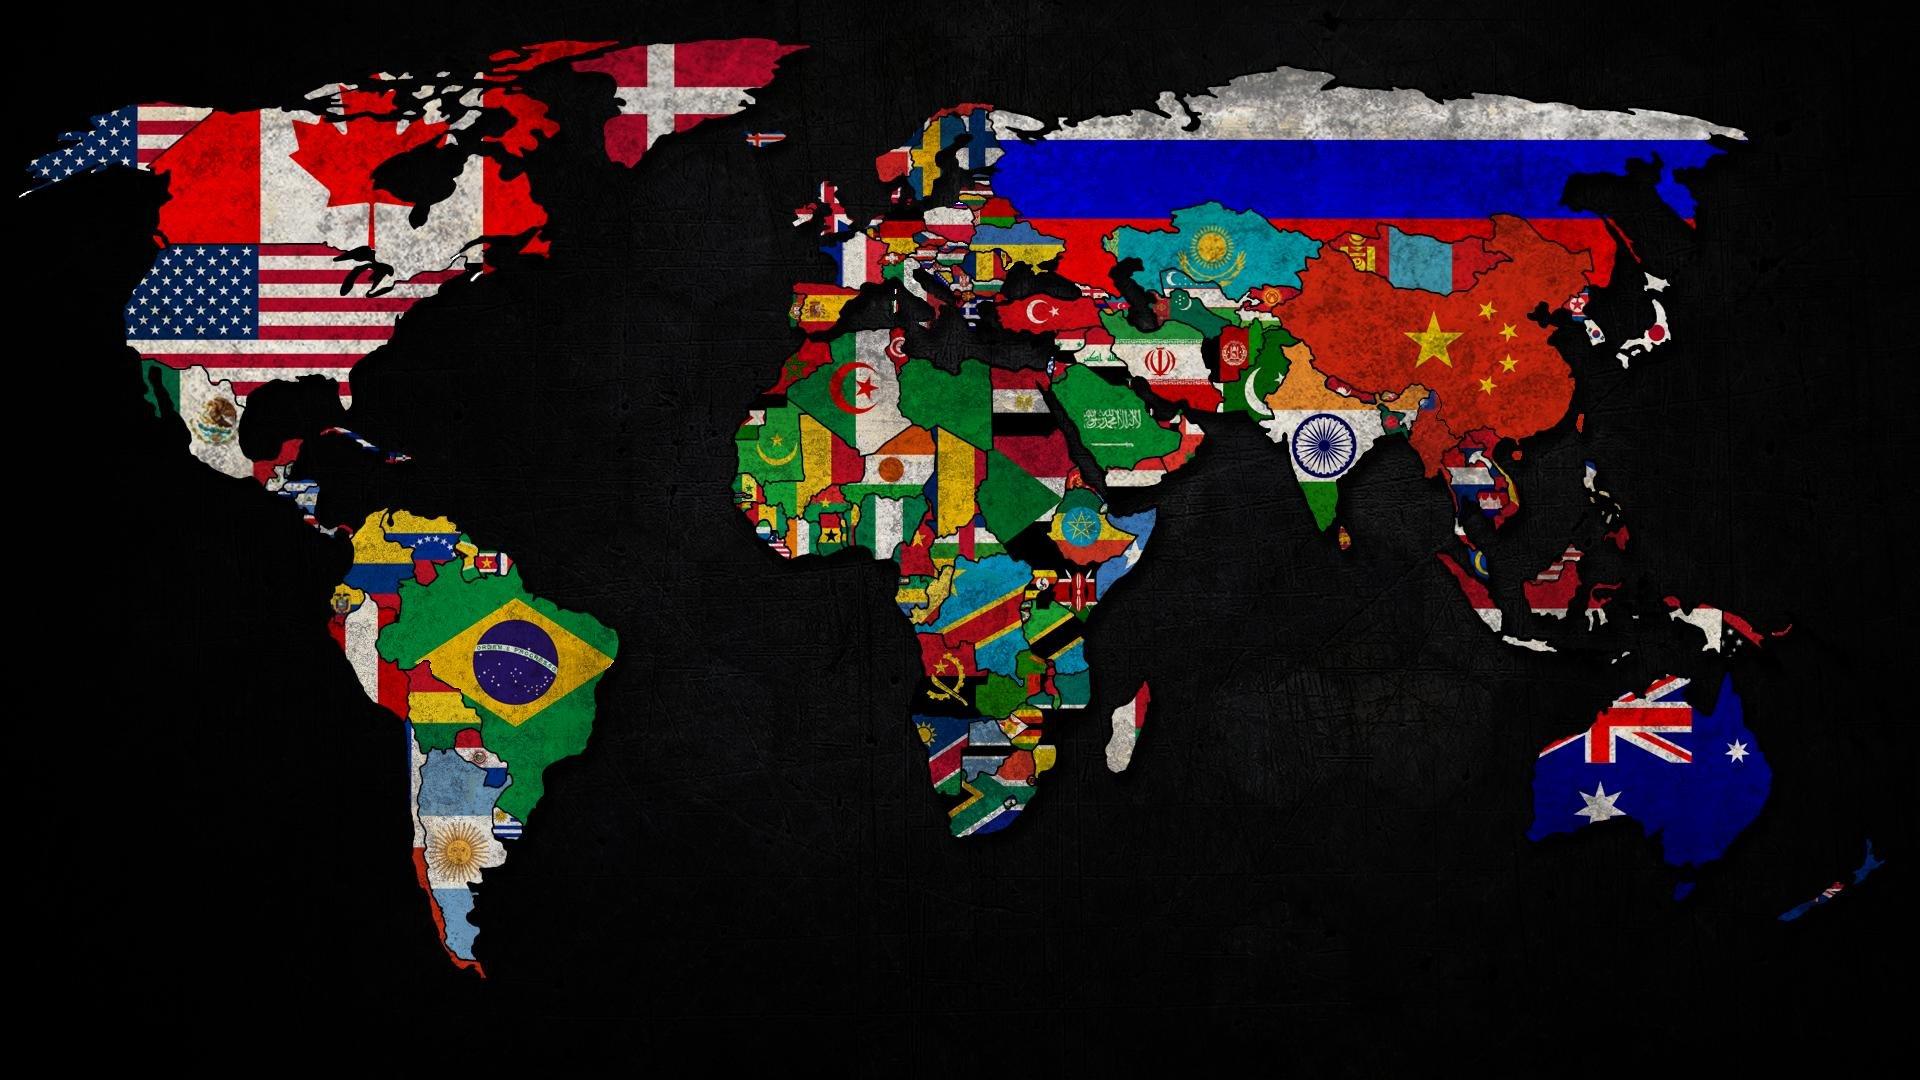 World map wallpapers 1920x1080 full hd 1080p desktop backgrounds best world map wallpaper id486277 for high resolution full hd 1080p desktop gumiabroncs Gallery